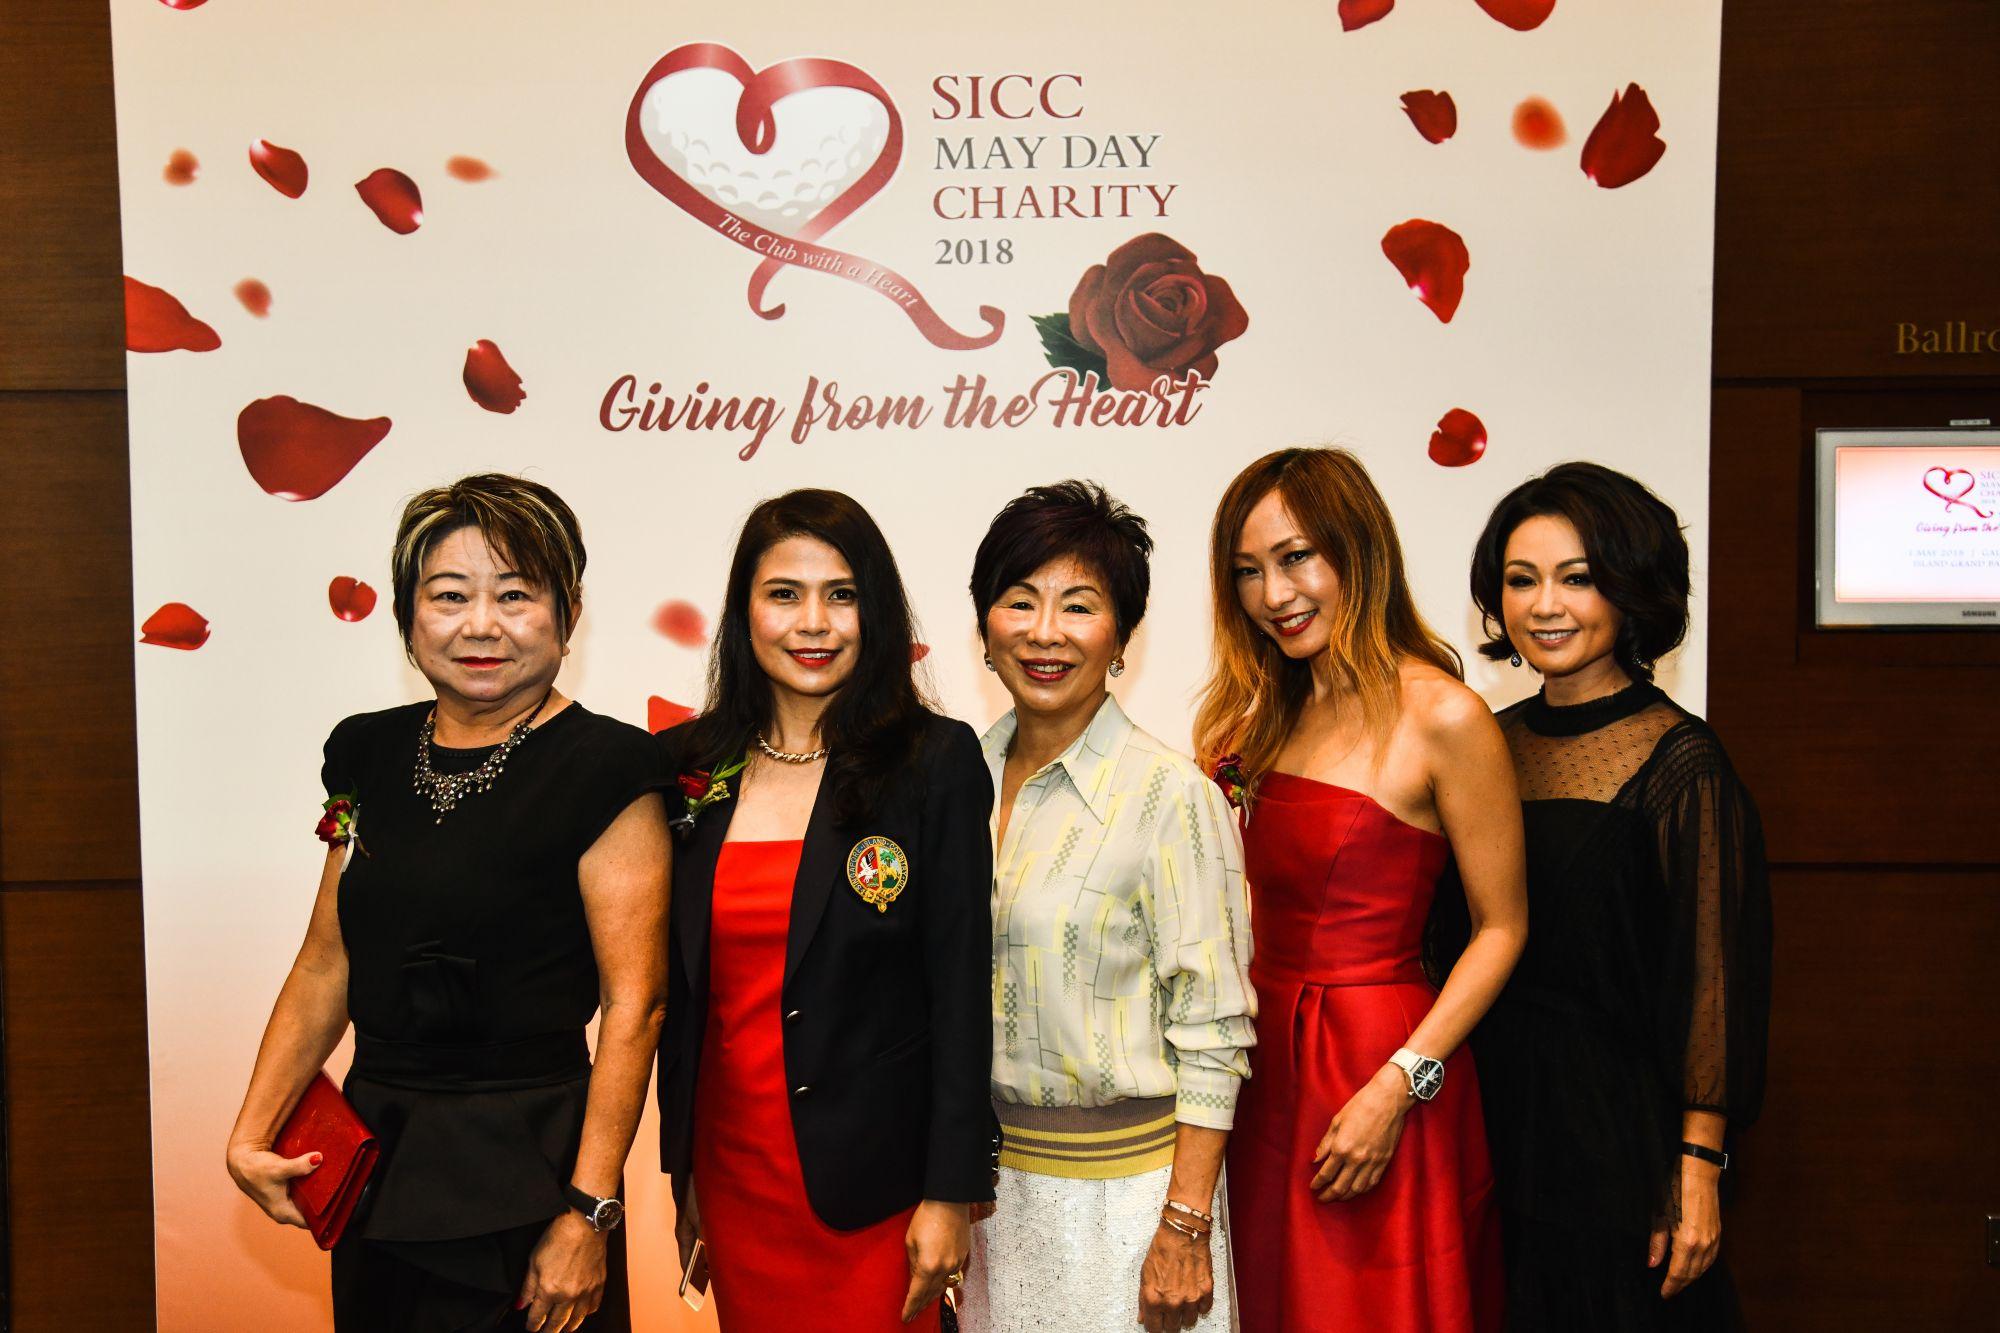 Jeannie Lau, Marilyn Lum, Chia Hwee Siang, Tan Min-Li, Vanessa Yeo